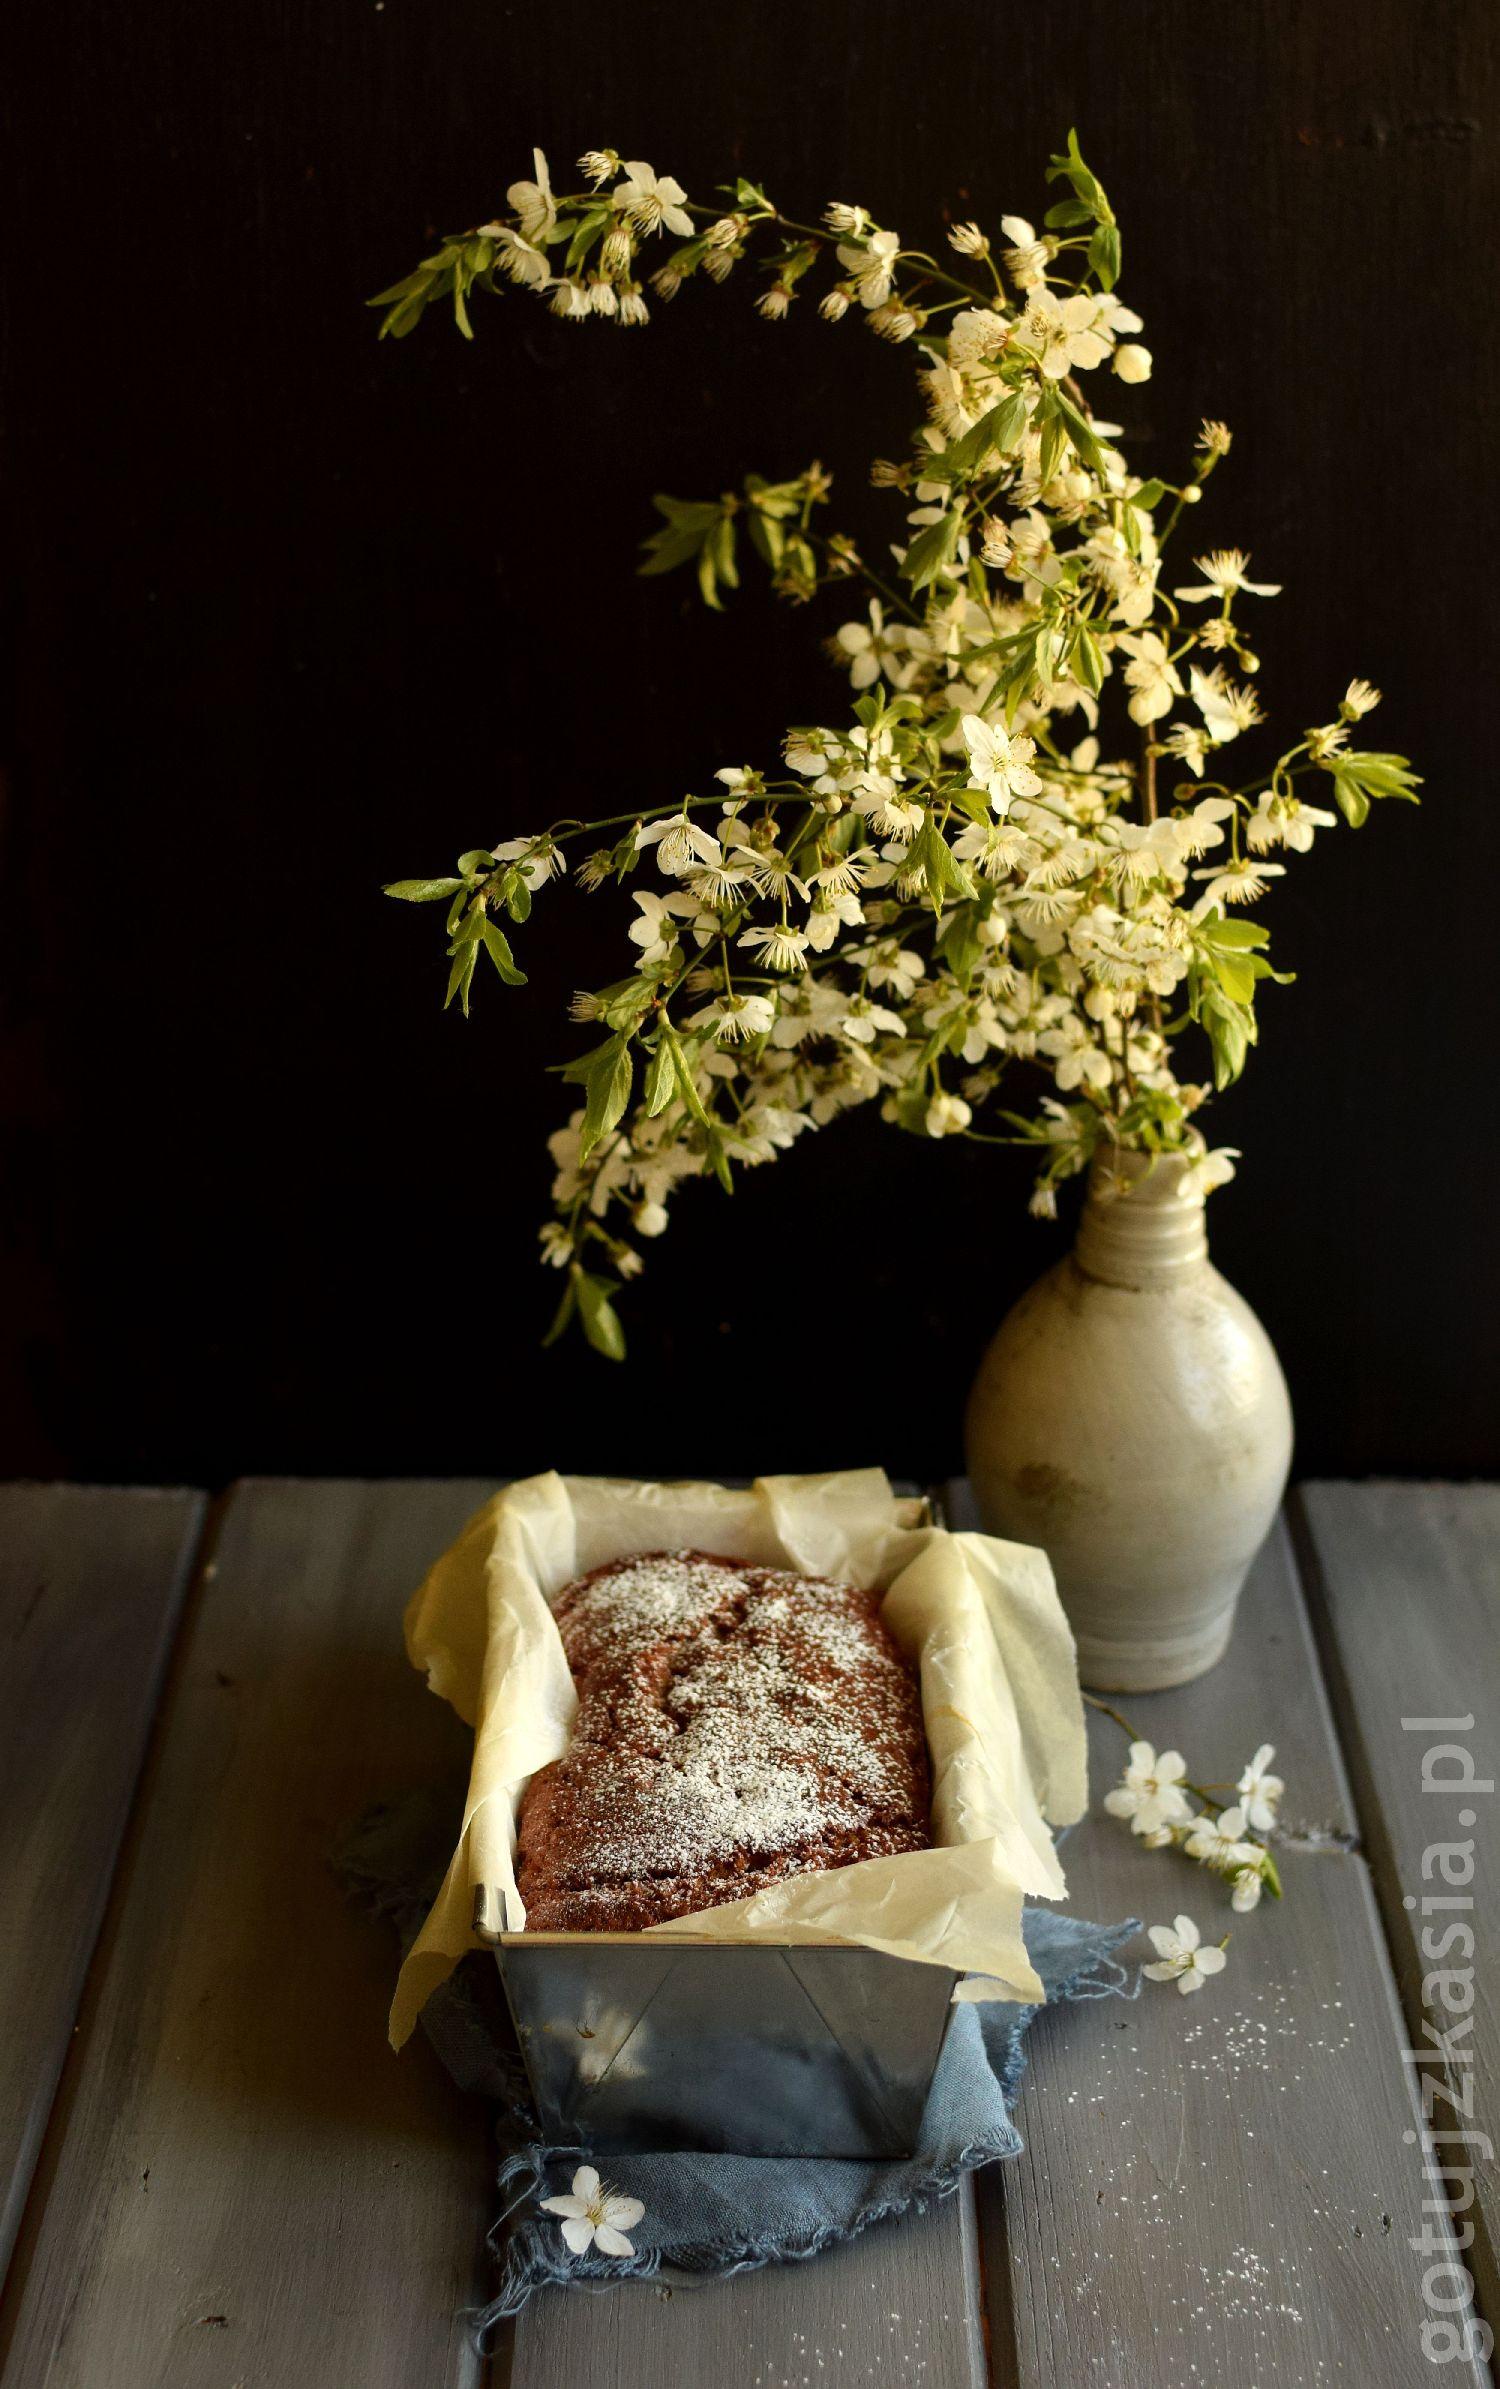 ciasto bananowe 1